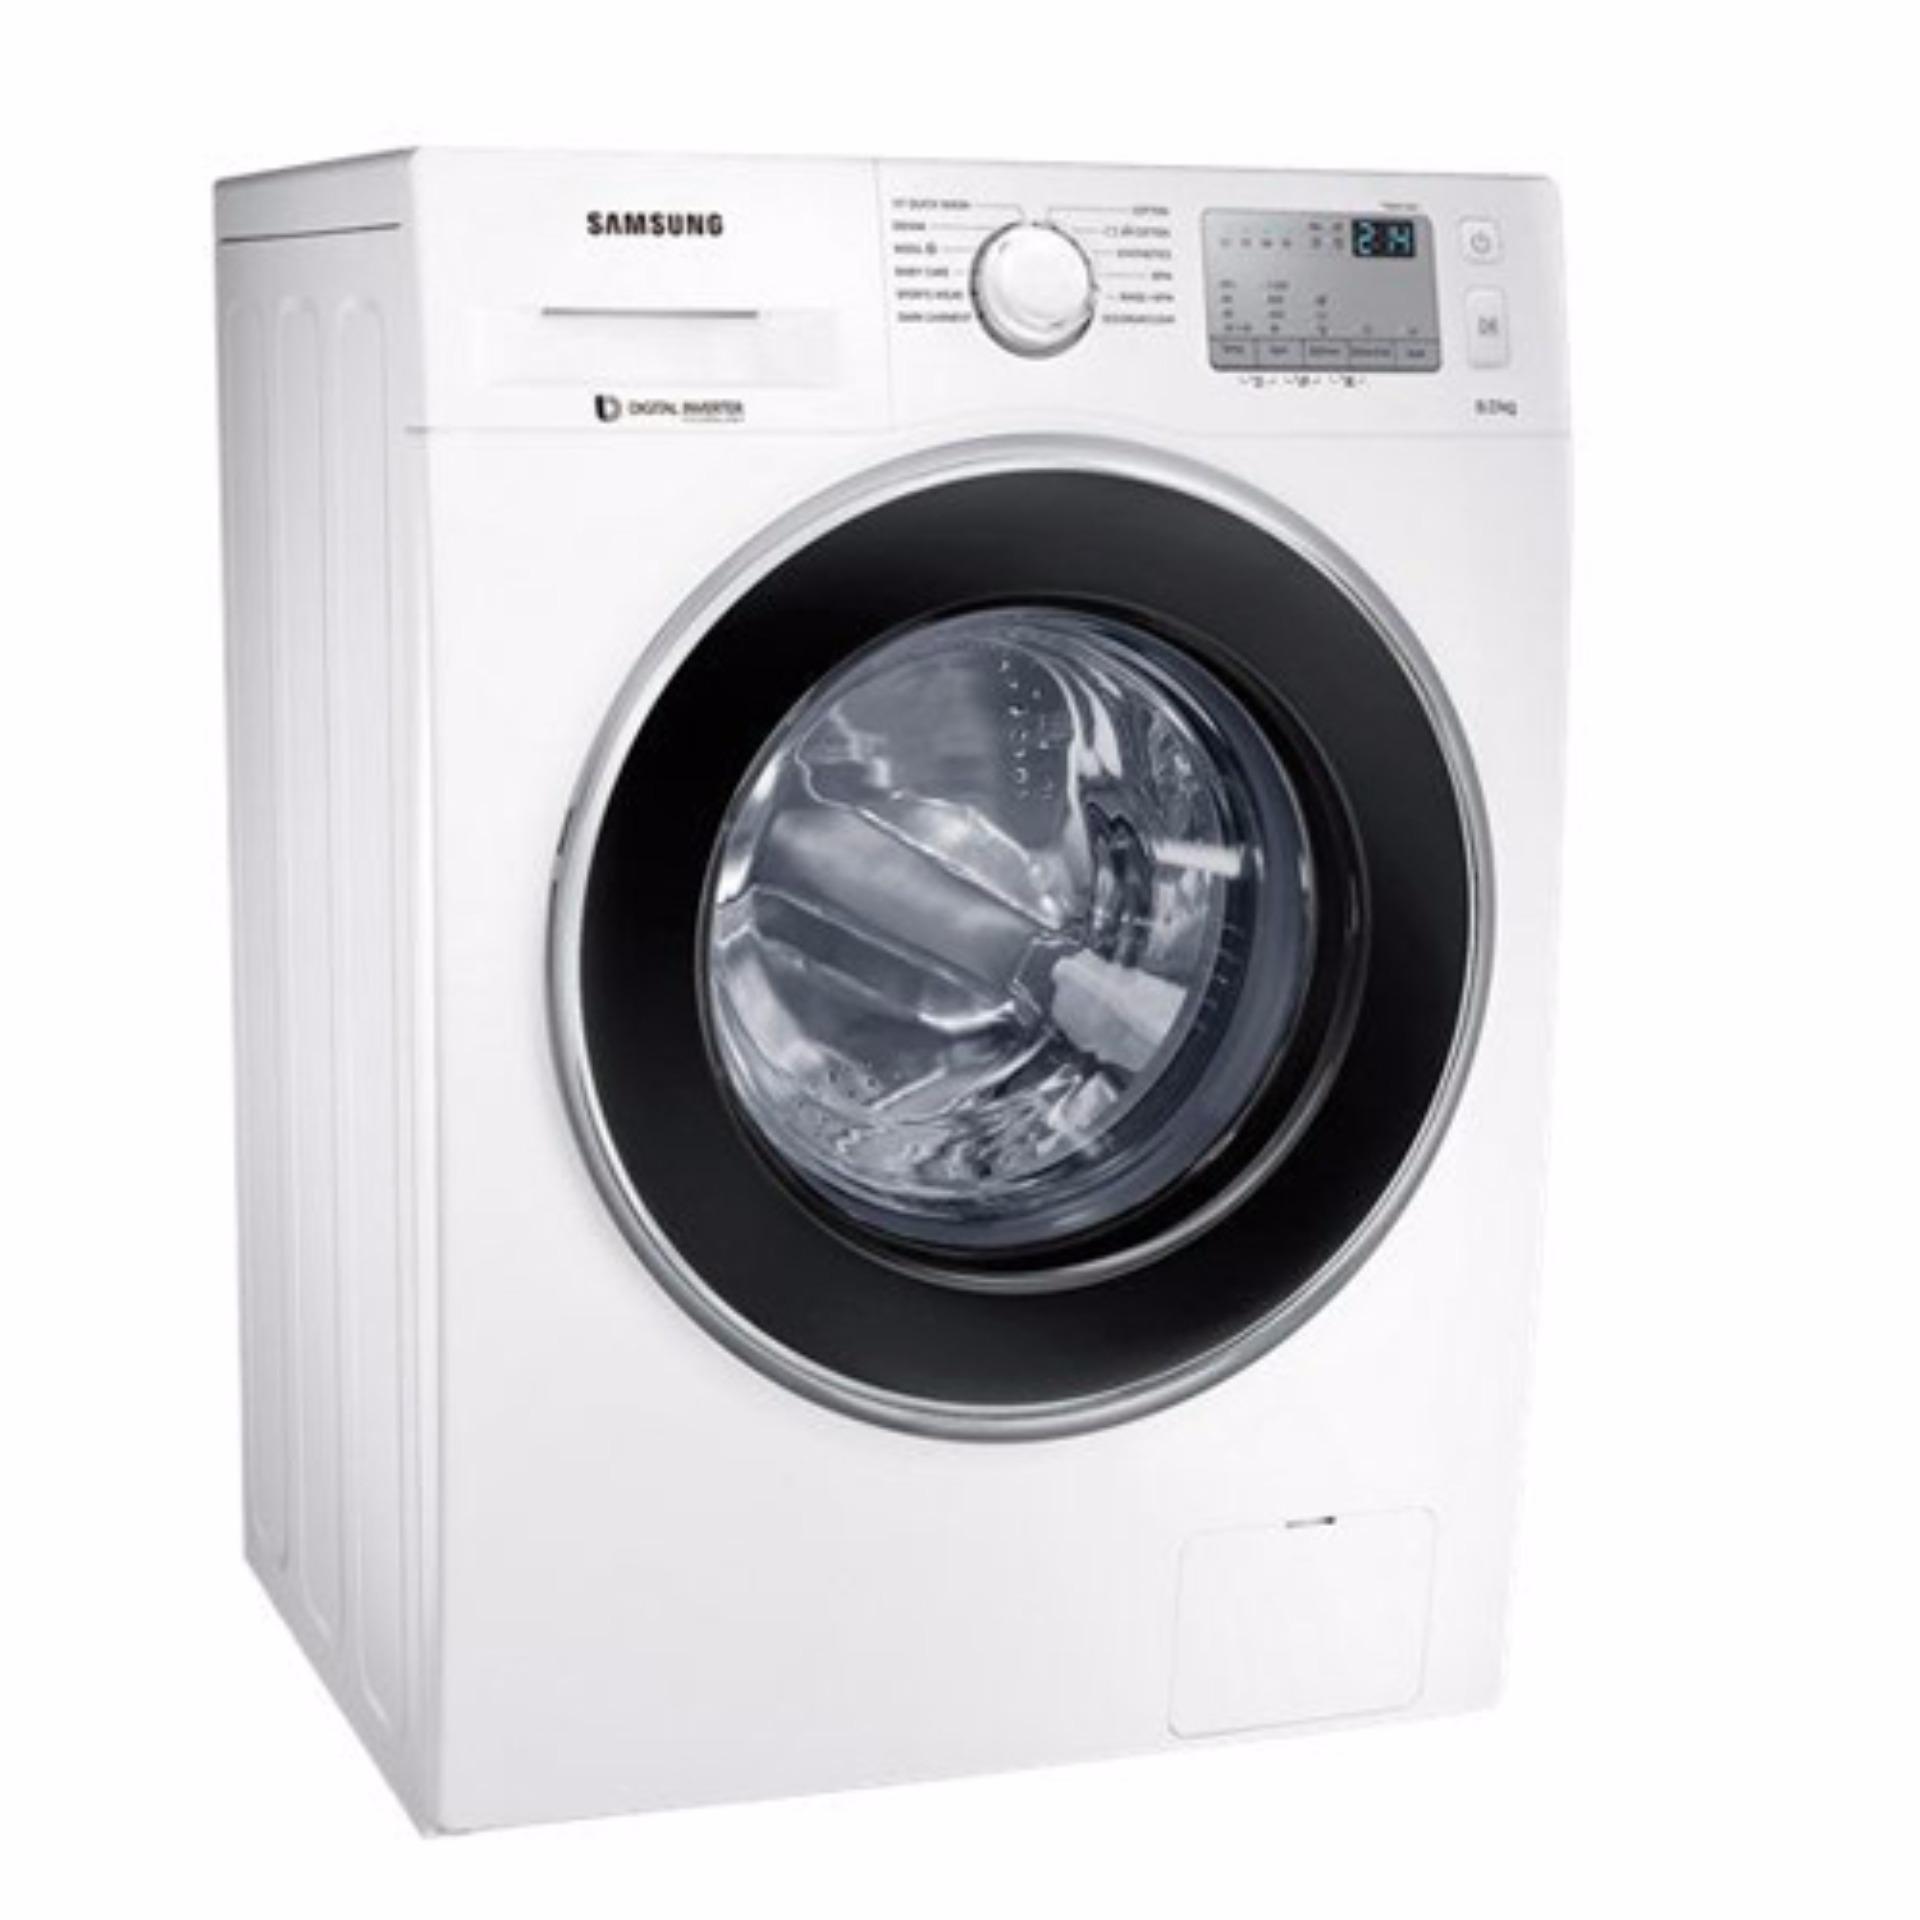 Samsung Mesin Cuci Front Loading 75 Kg Ww75k5210yw White Free Ongkir Washer Ww80j4233gw Se